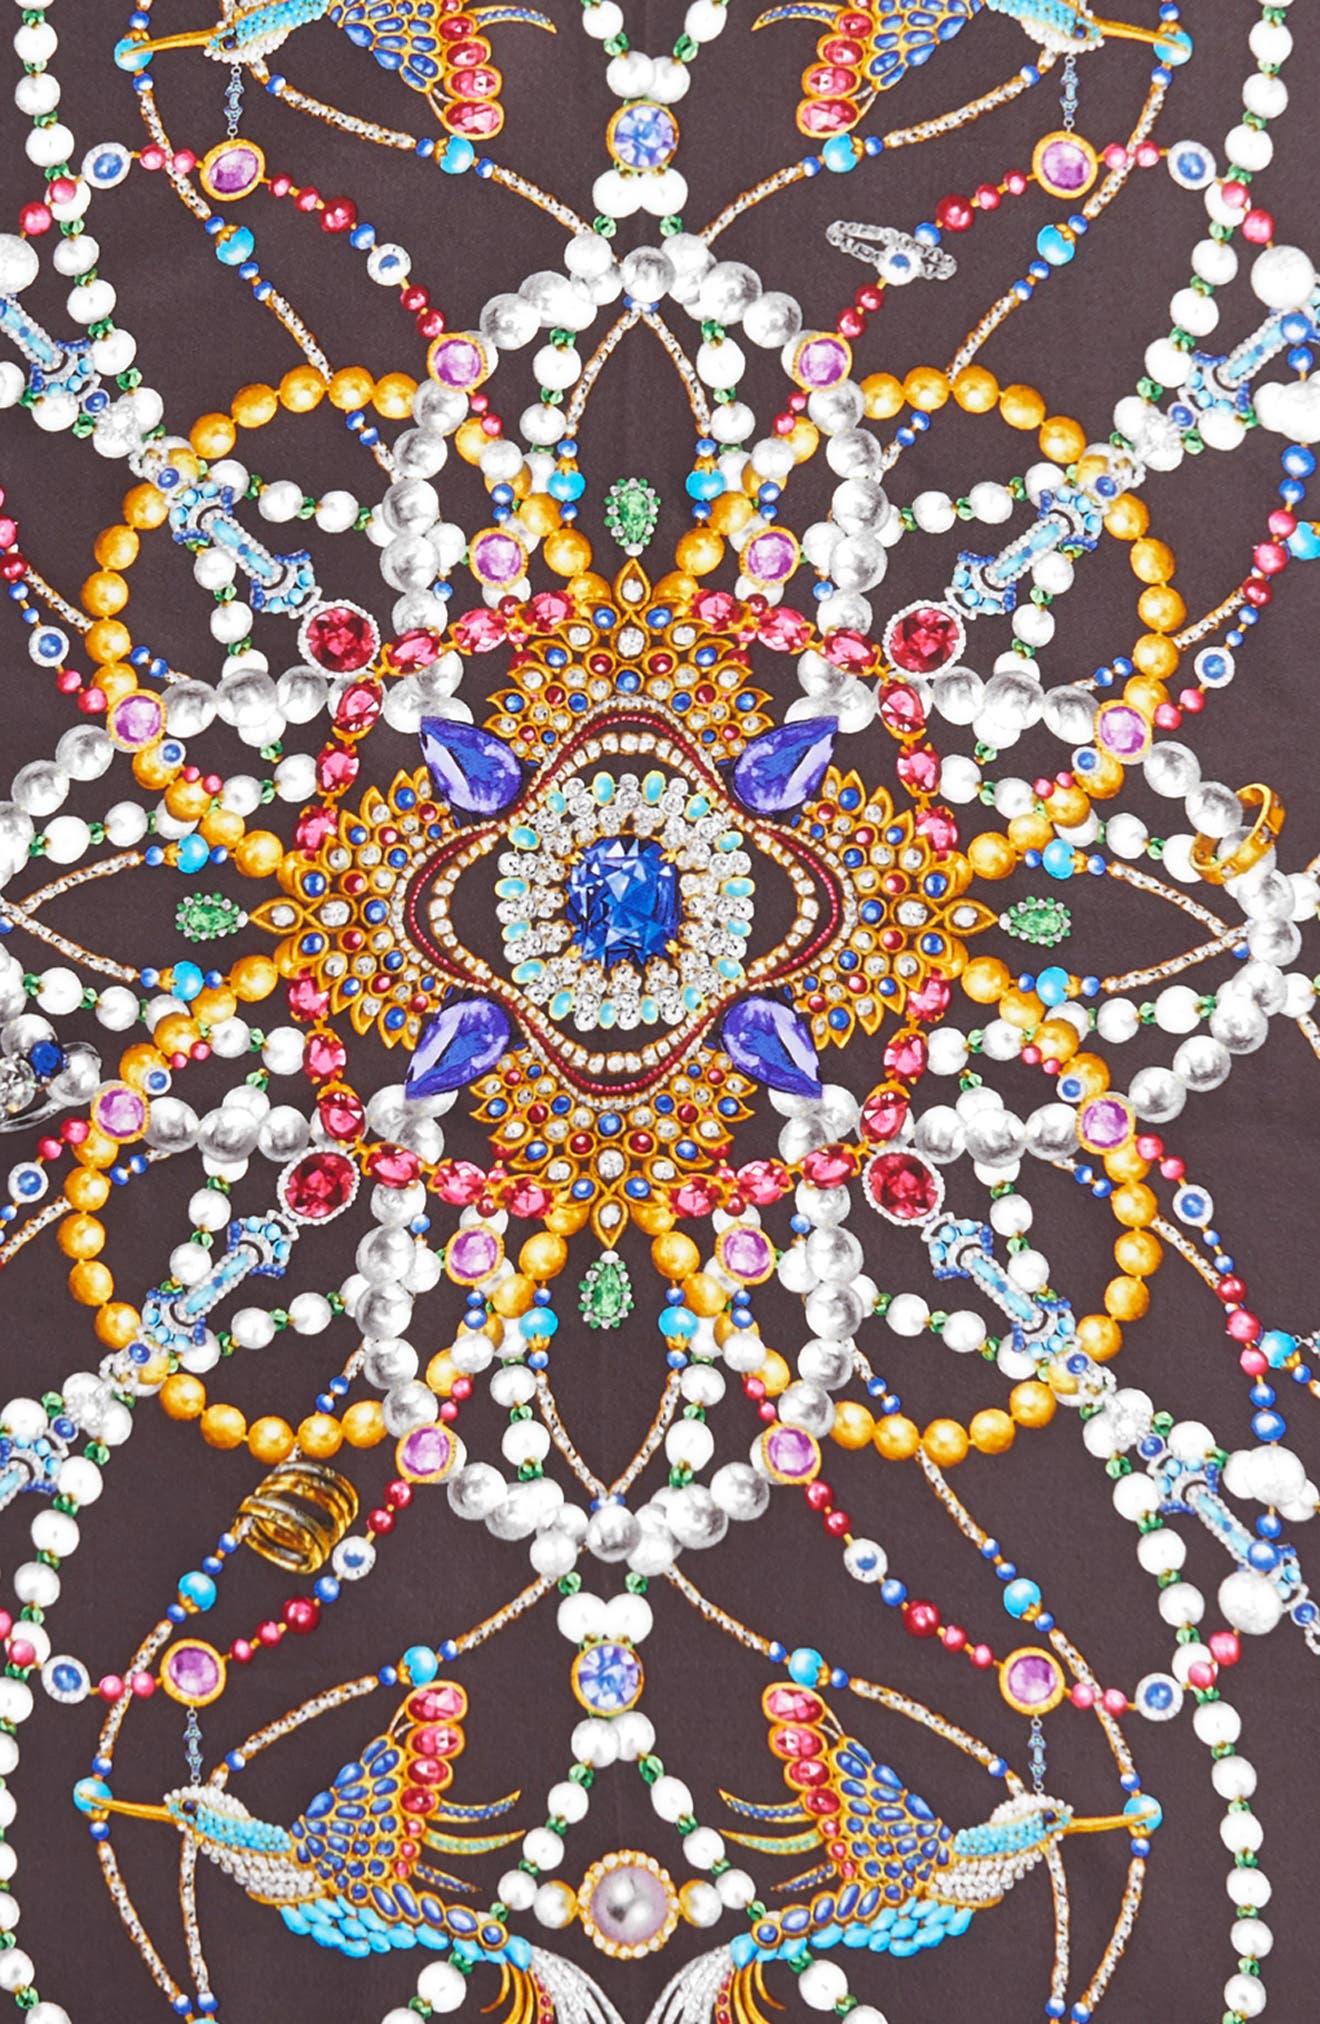 Heirloom Series Print Silk Scarf,                             Alternate thumbnail 4, color,                             Magnet